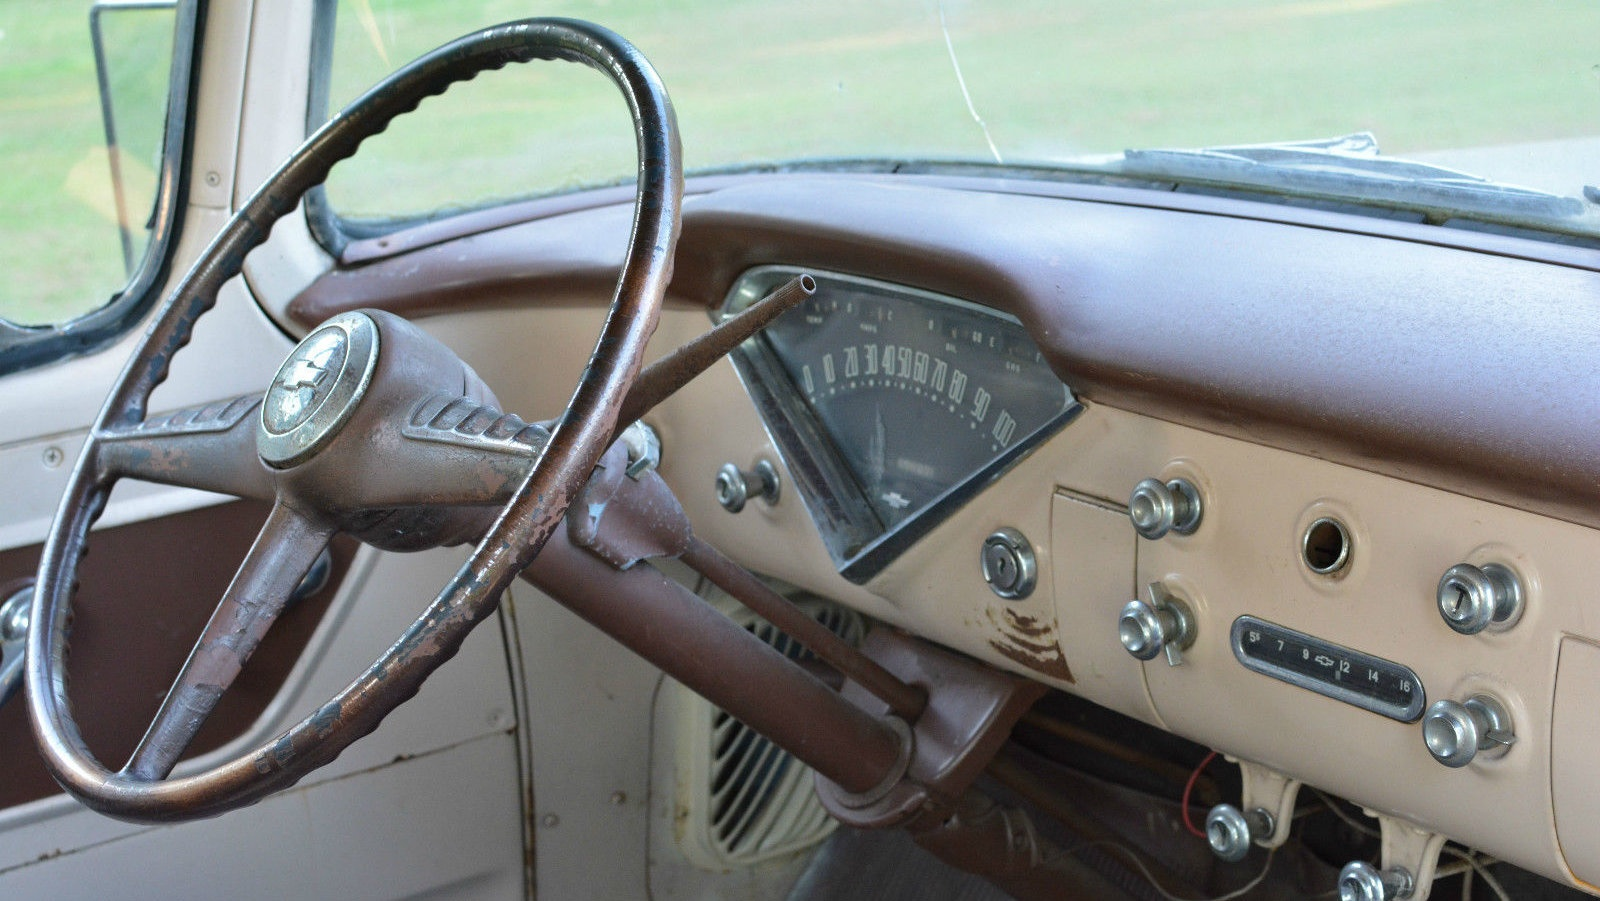 Barn Finds Maritime Mustang Description 3100 V6 Enginejpg Image Http Barnfindscom Wp Content Uploads 2016 06 1955 Chevrolet Interior 630x355